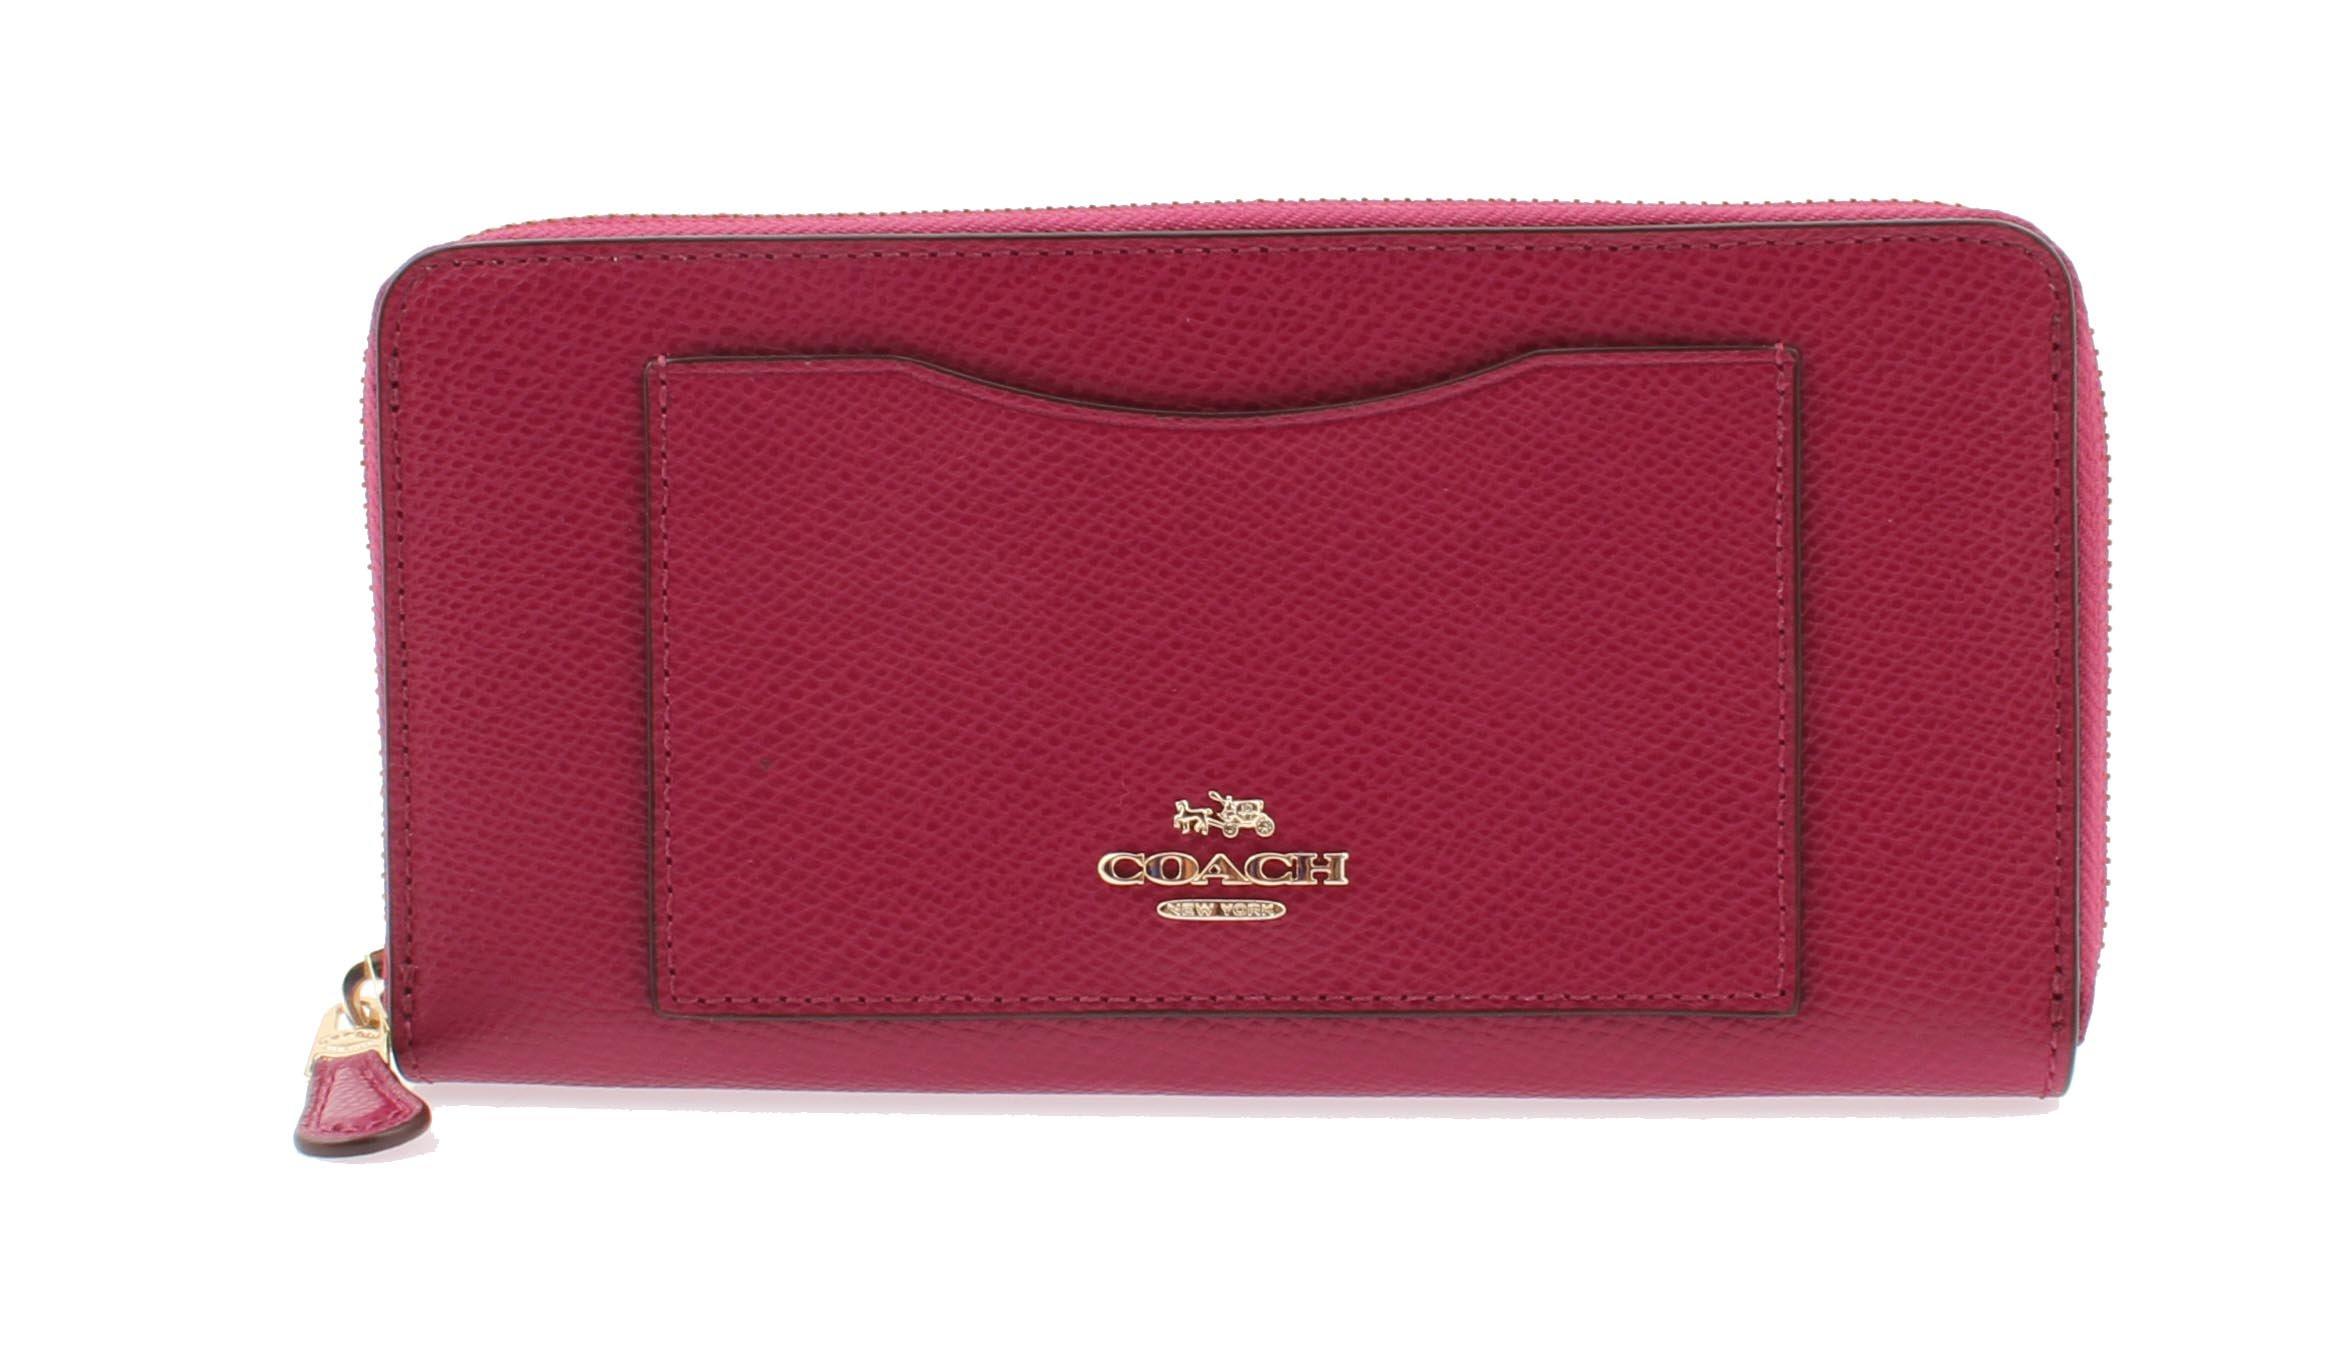 Coach Crossgrain Leather Accordion Zip Wallet in Fuchsia - F54007 IMFUS